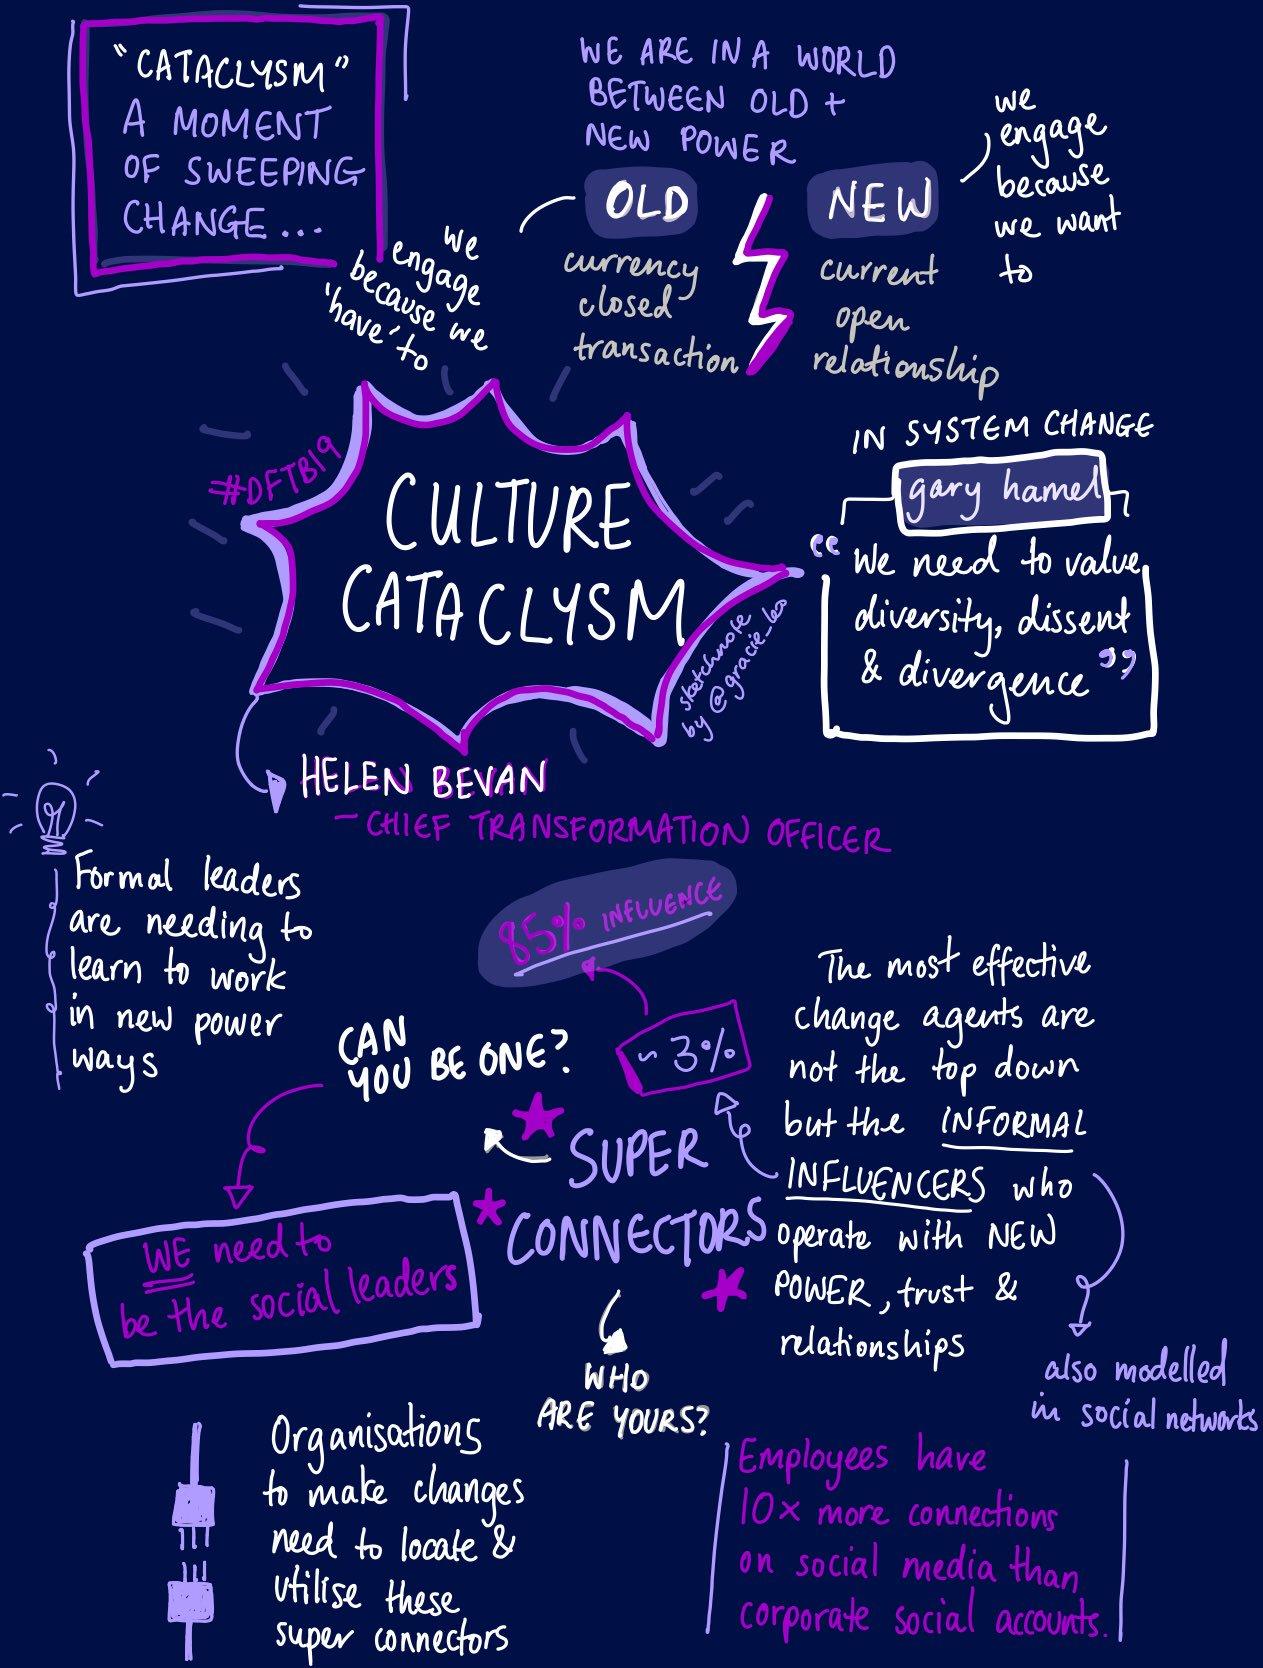 Culture Cataclysm - Helen Bevan at DFTB19 Sketchnote